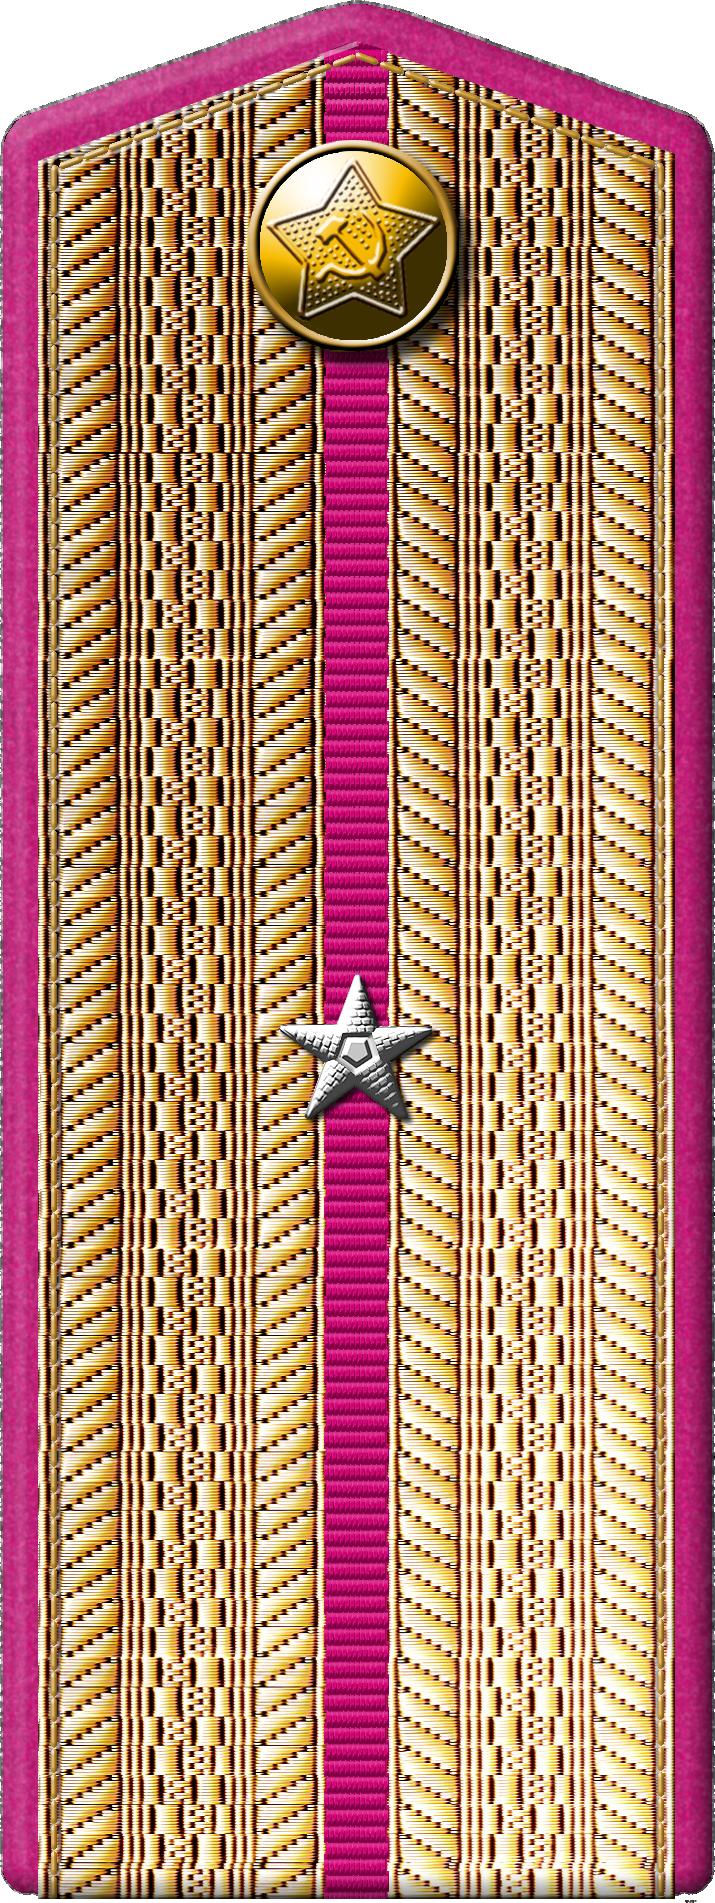 1943inf-p12